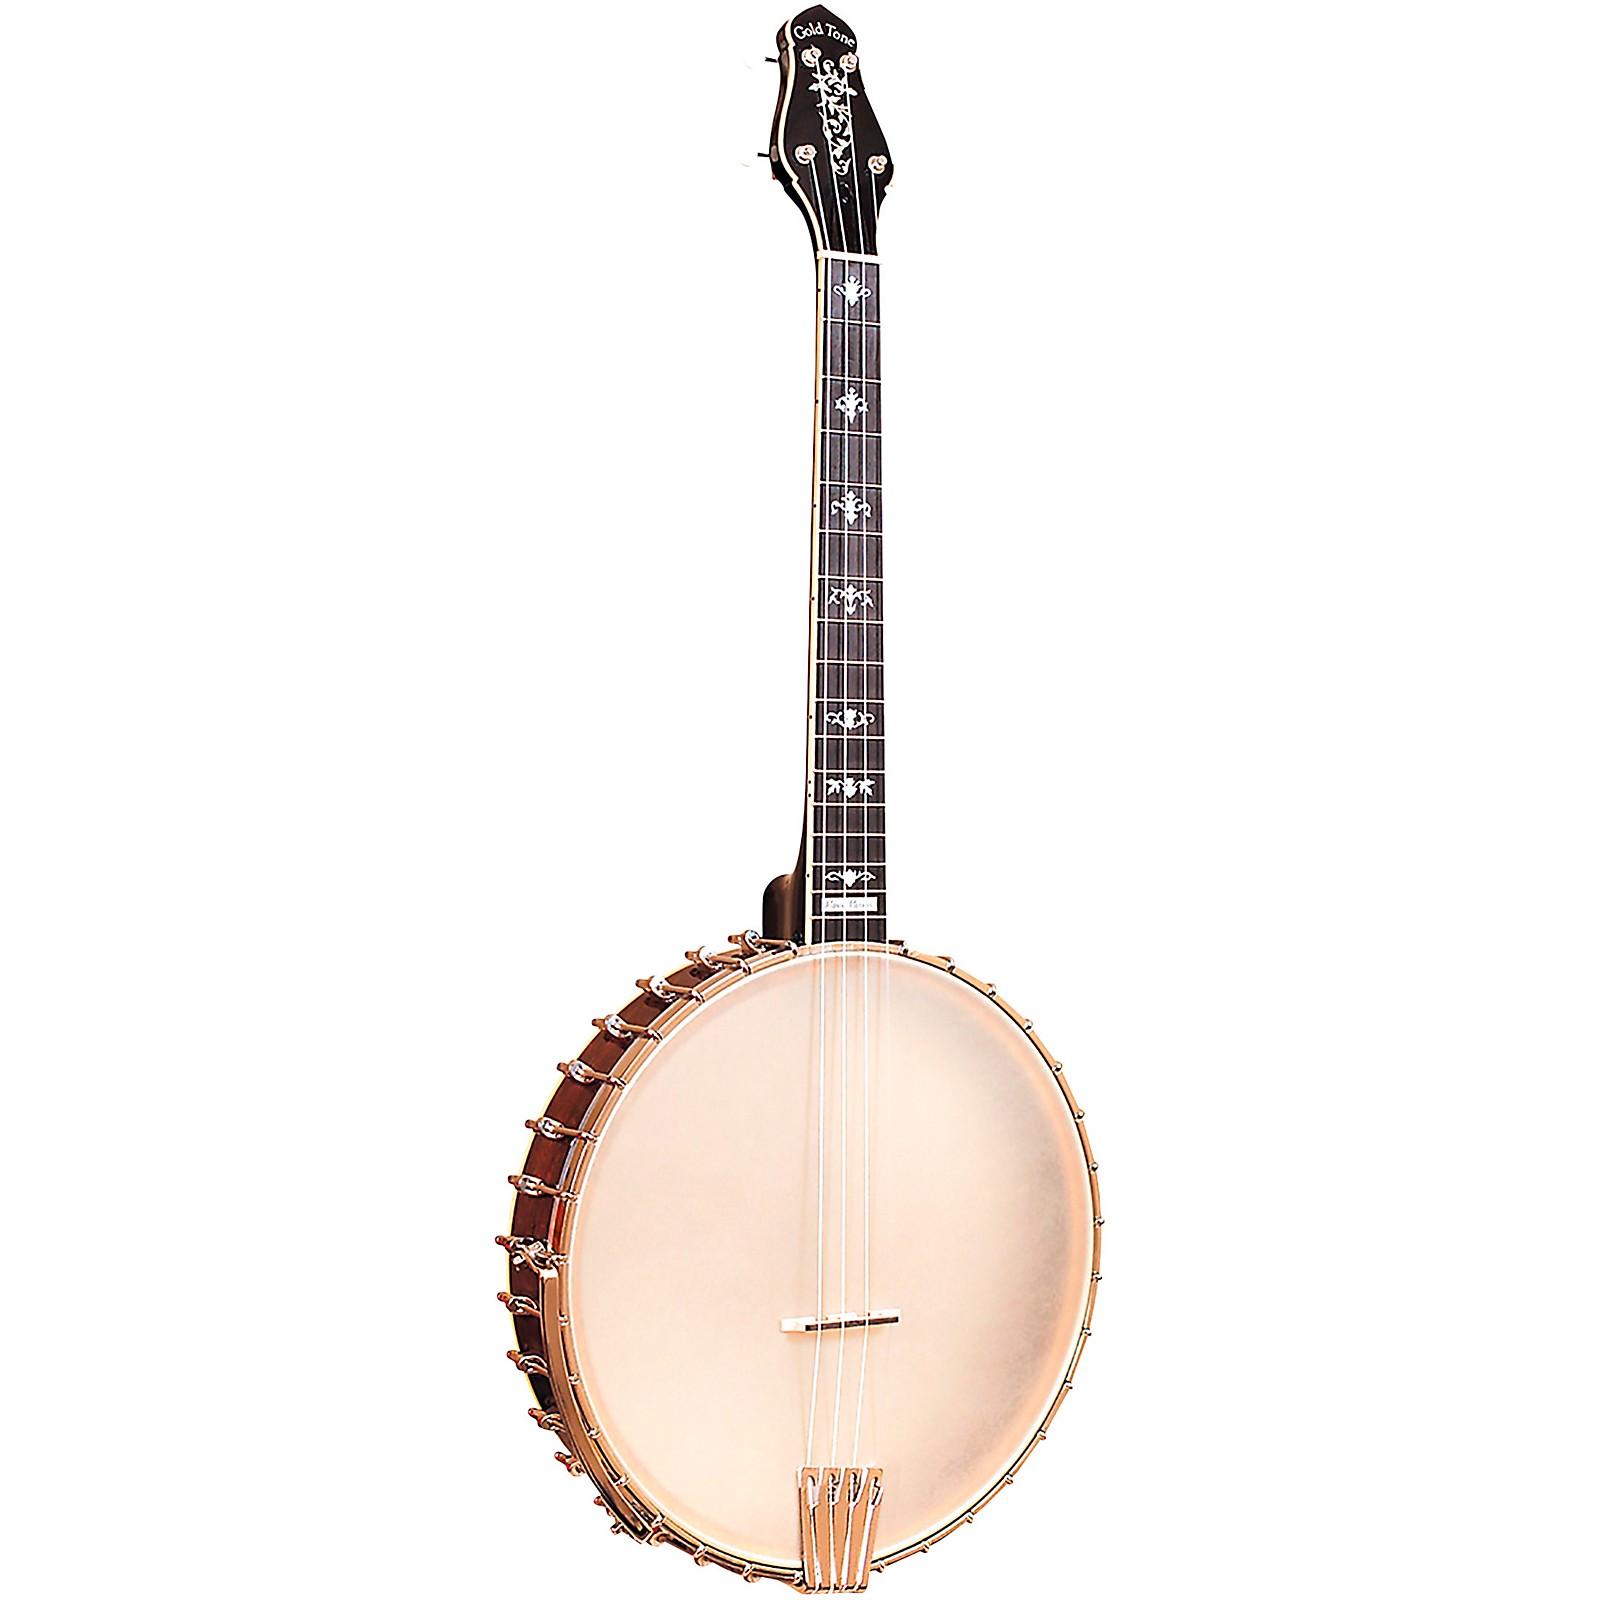 Gold Tone Marcy Marxer Left-Handed Cello Banjo